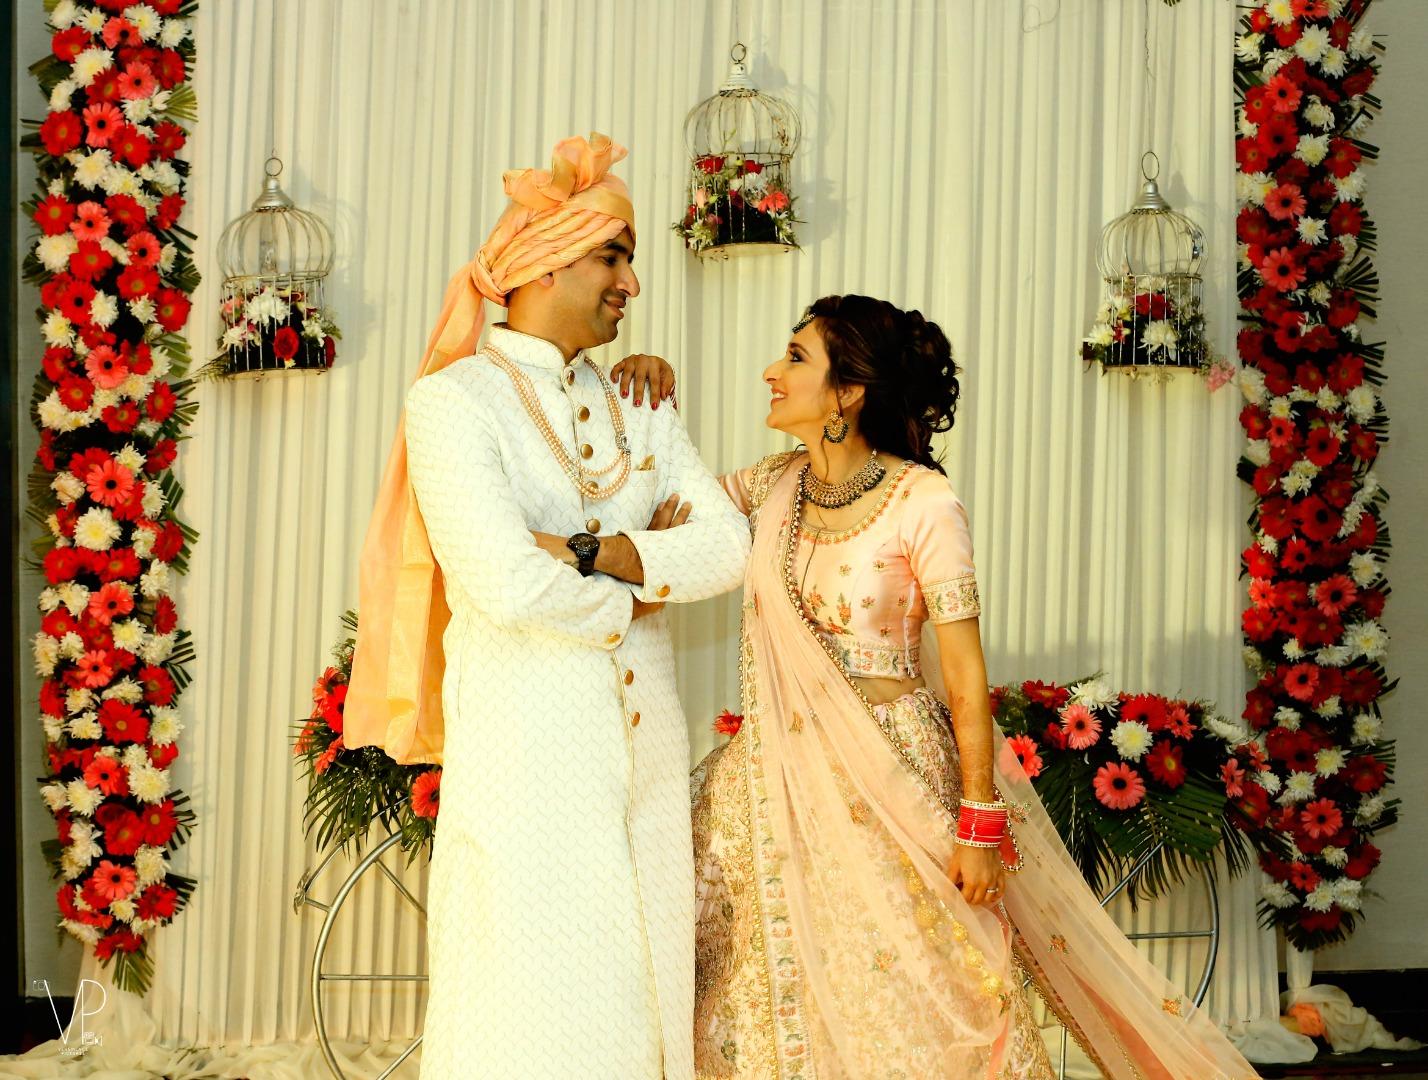 Best Floral Backdrops for Wedding Reception